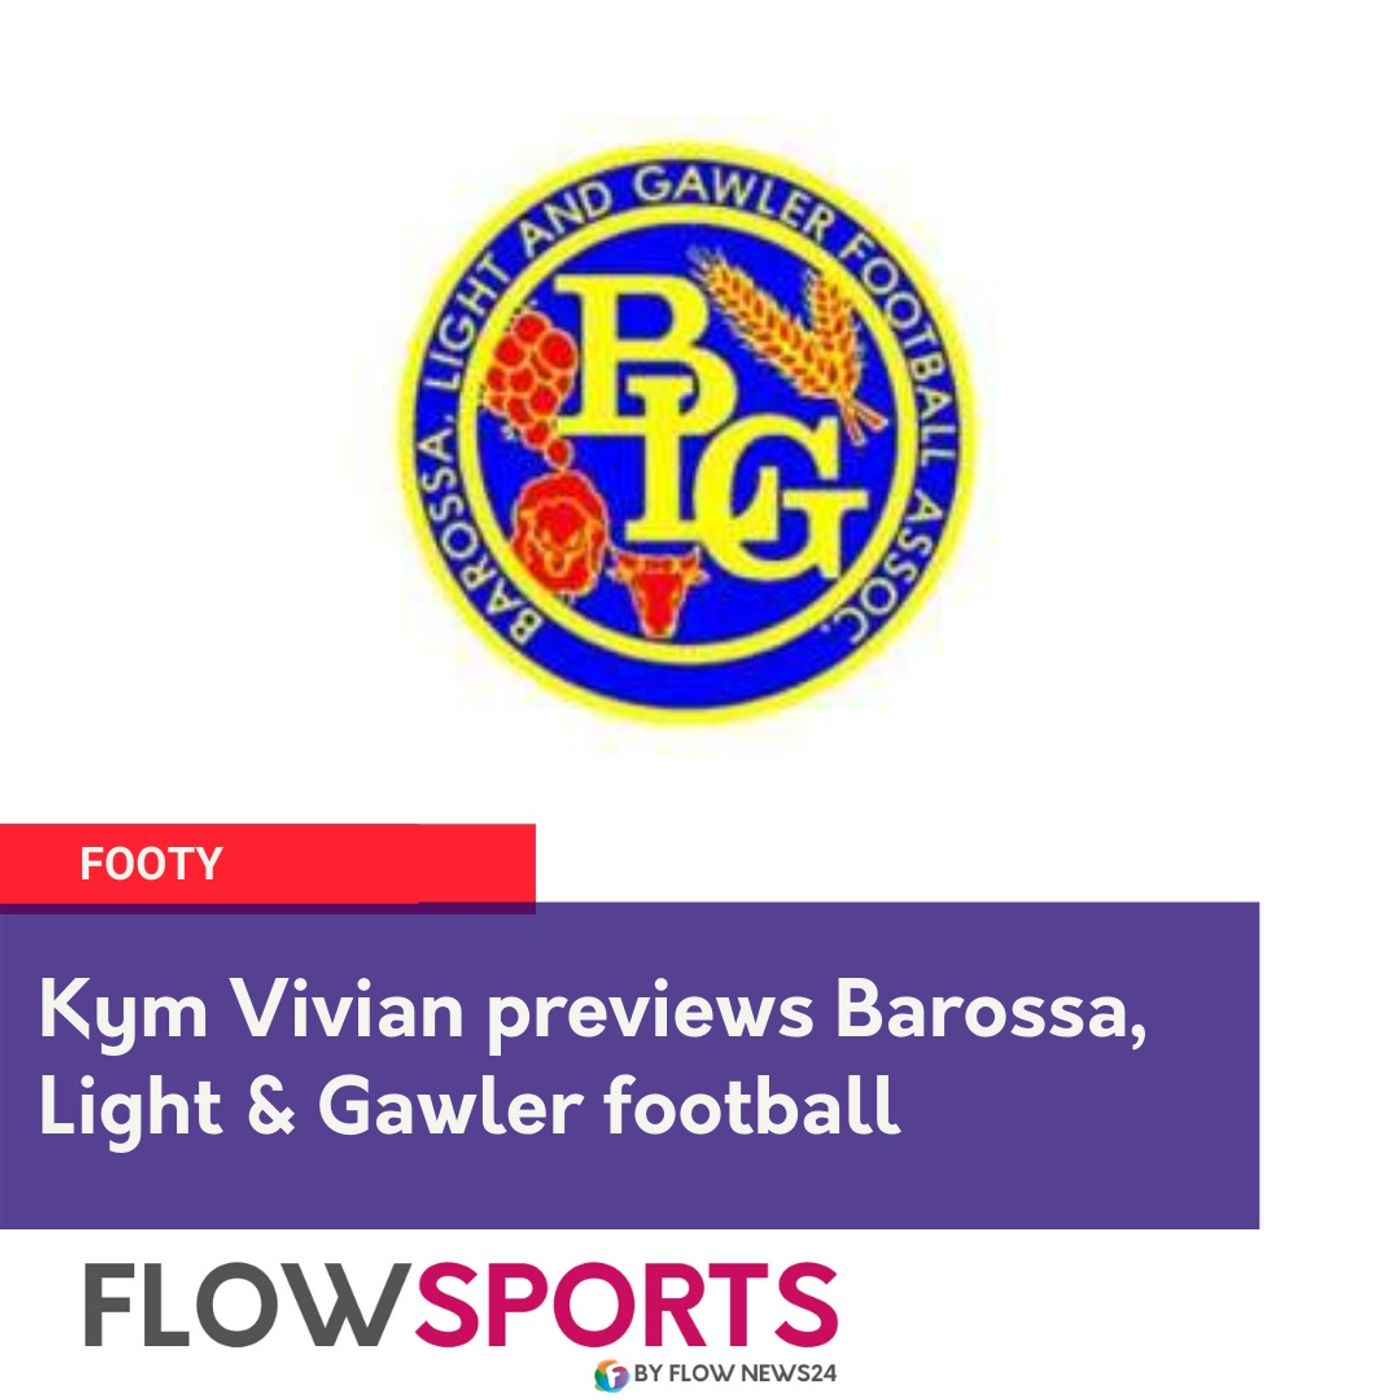 Kym Vivian previews round 9 of Barossa Light & Gawler Football